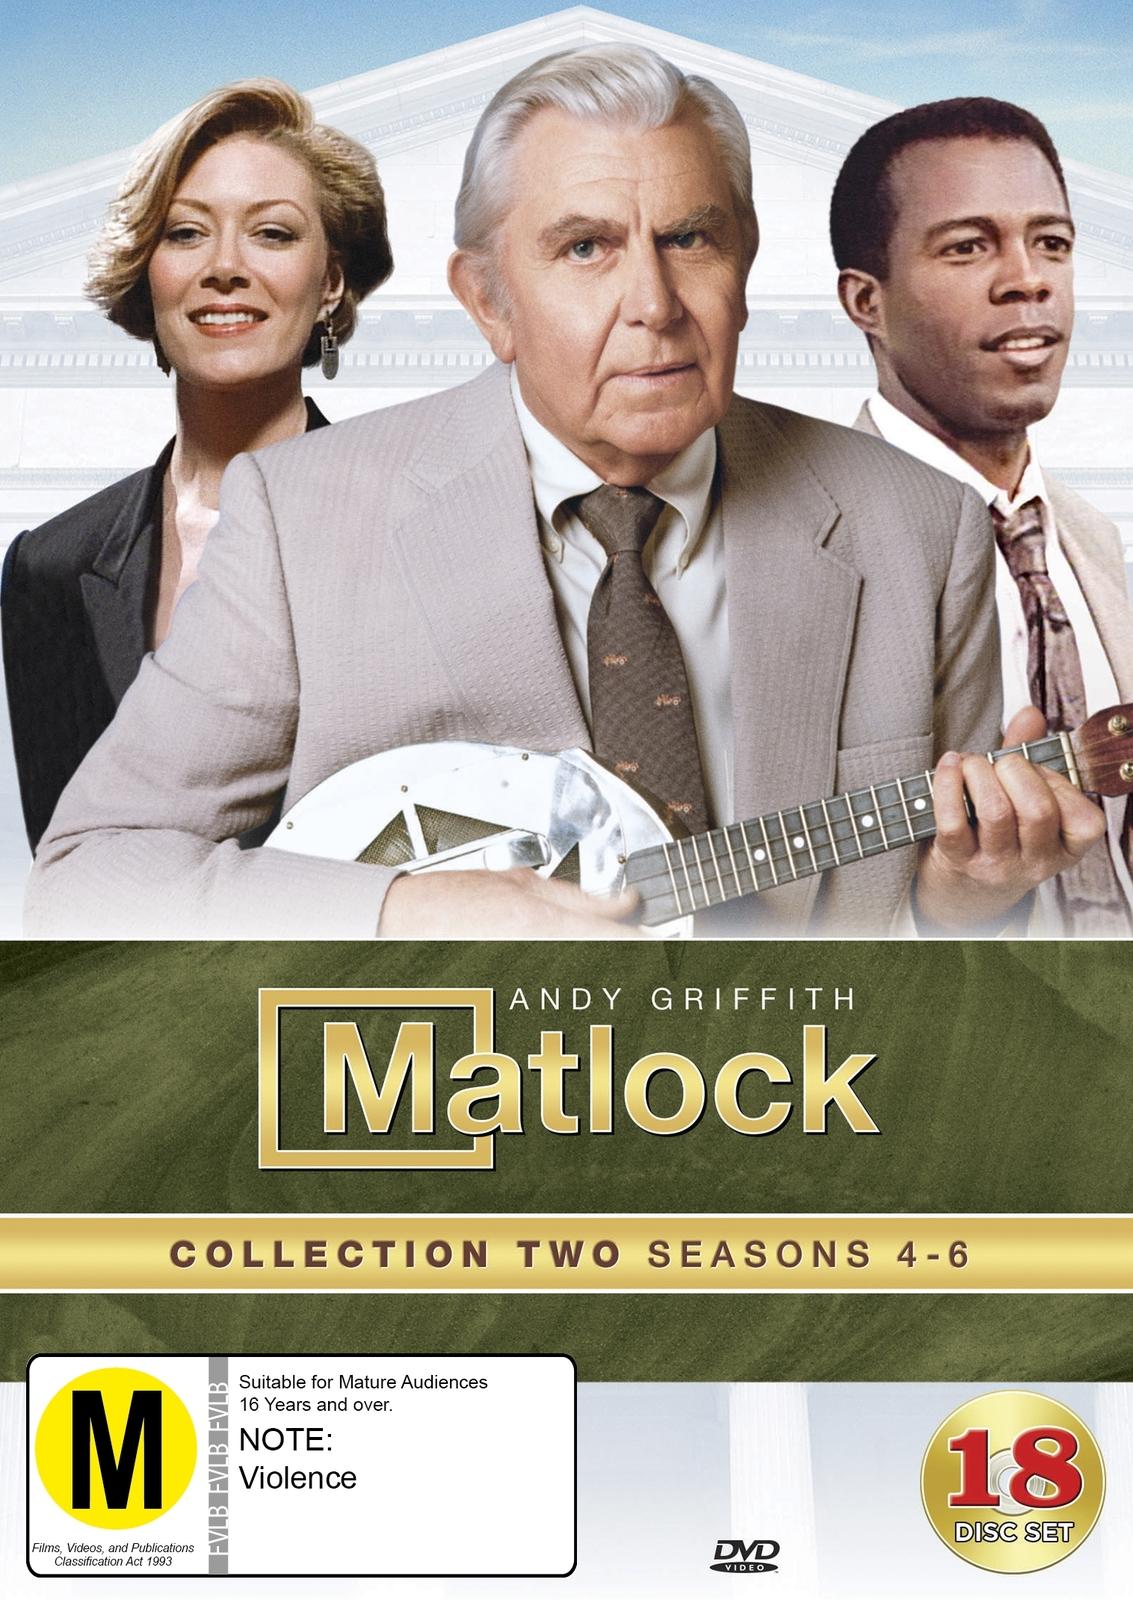 Matlock: Collection 2 - (Seasons 4-6) on DVD image